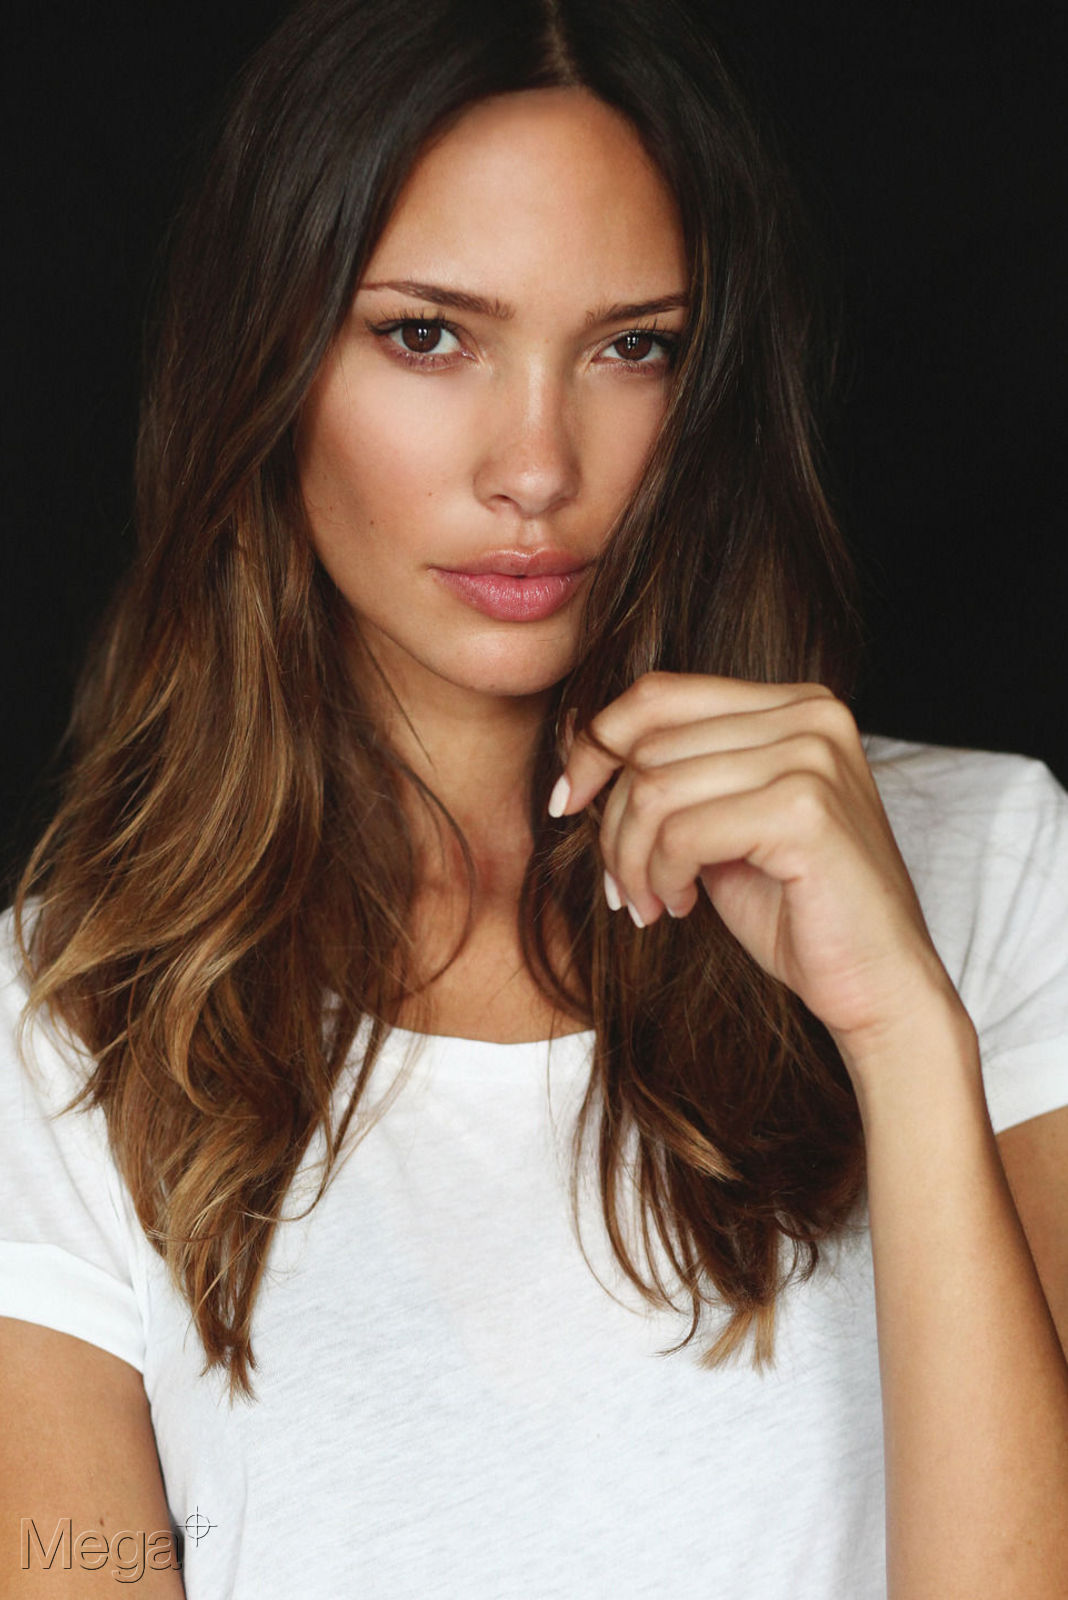 Sabrina Jales - Mega Model Agency